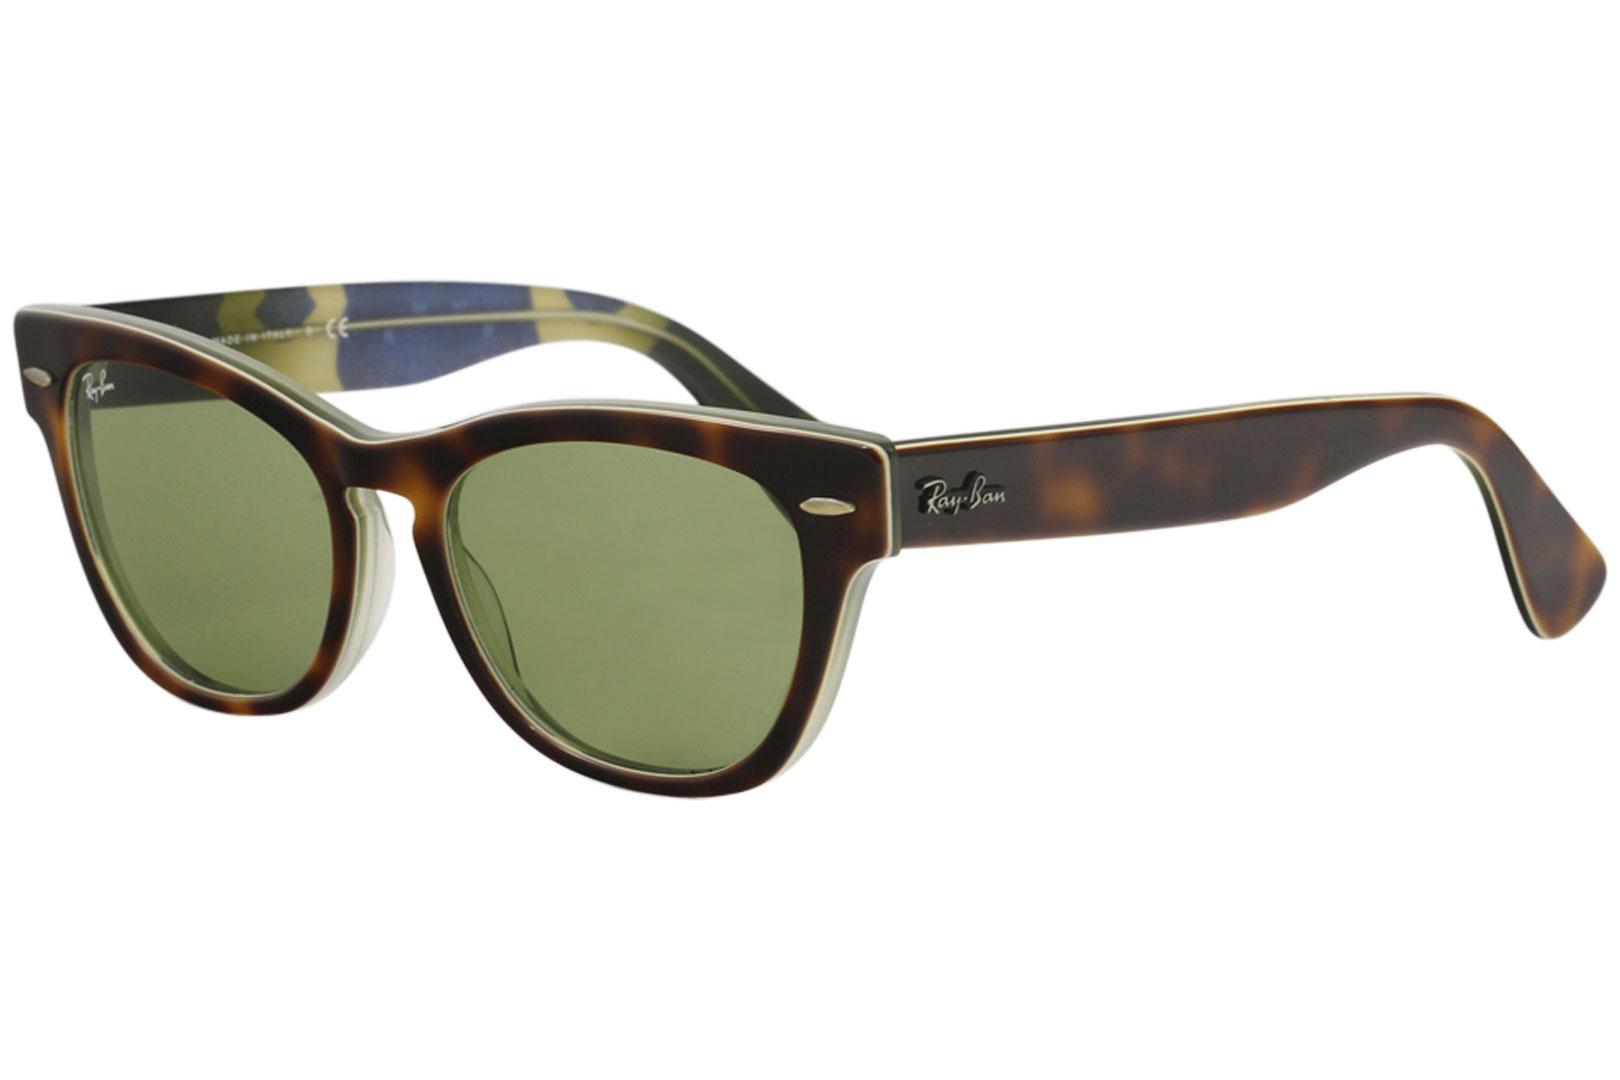 3075fc04b8 Ray Ban Women s Laramie Special RB4169 RB 4169 RayBan Fashion Square  Sunglasses